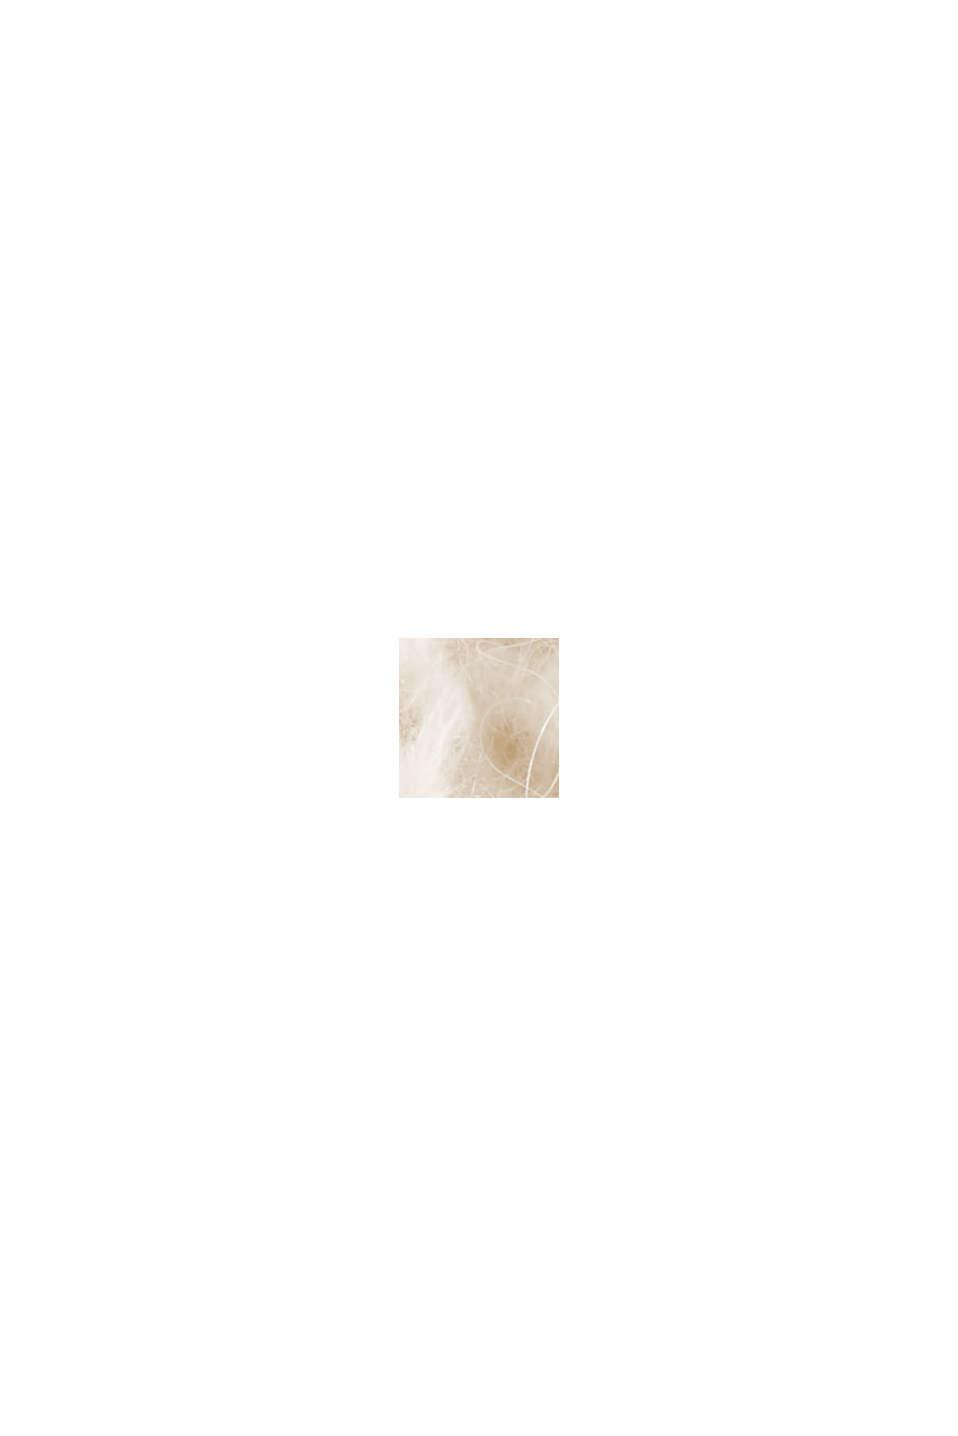 CURVY pointelle cardigan with wool/alpaca, ICE, swatch